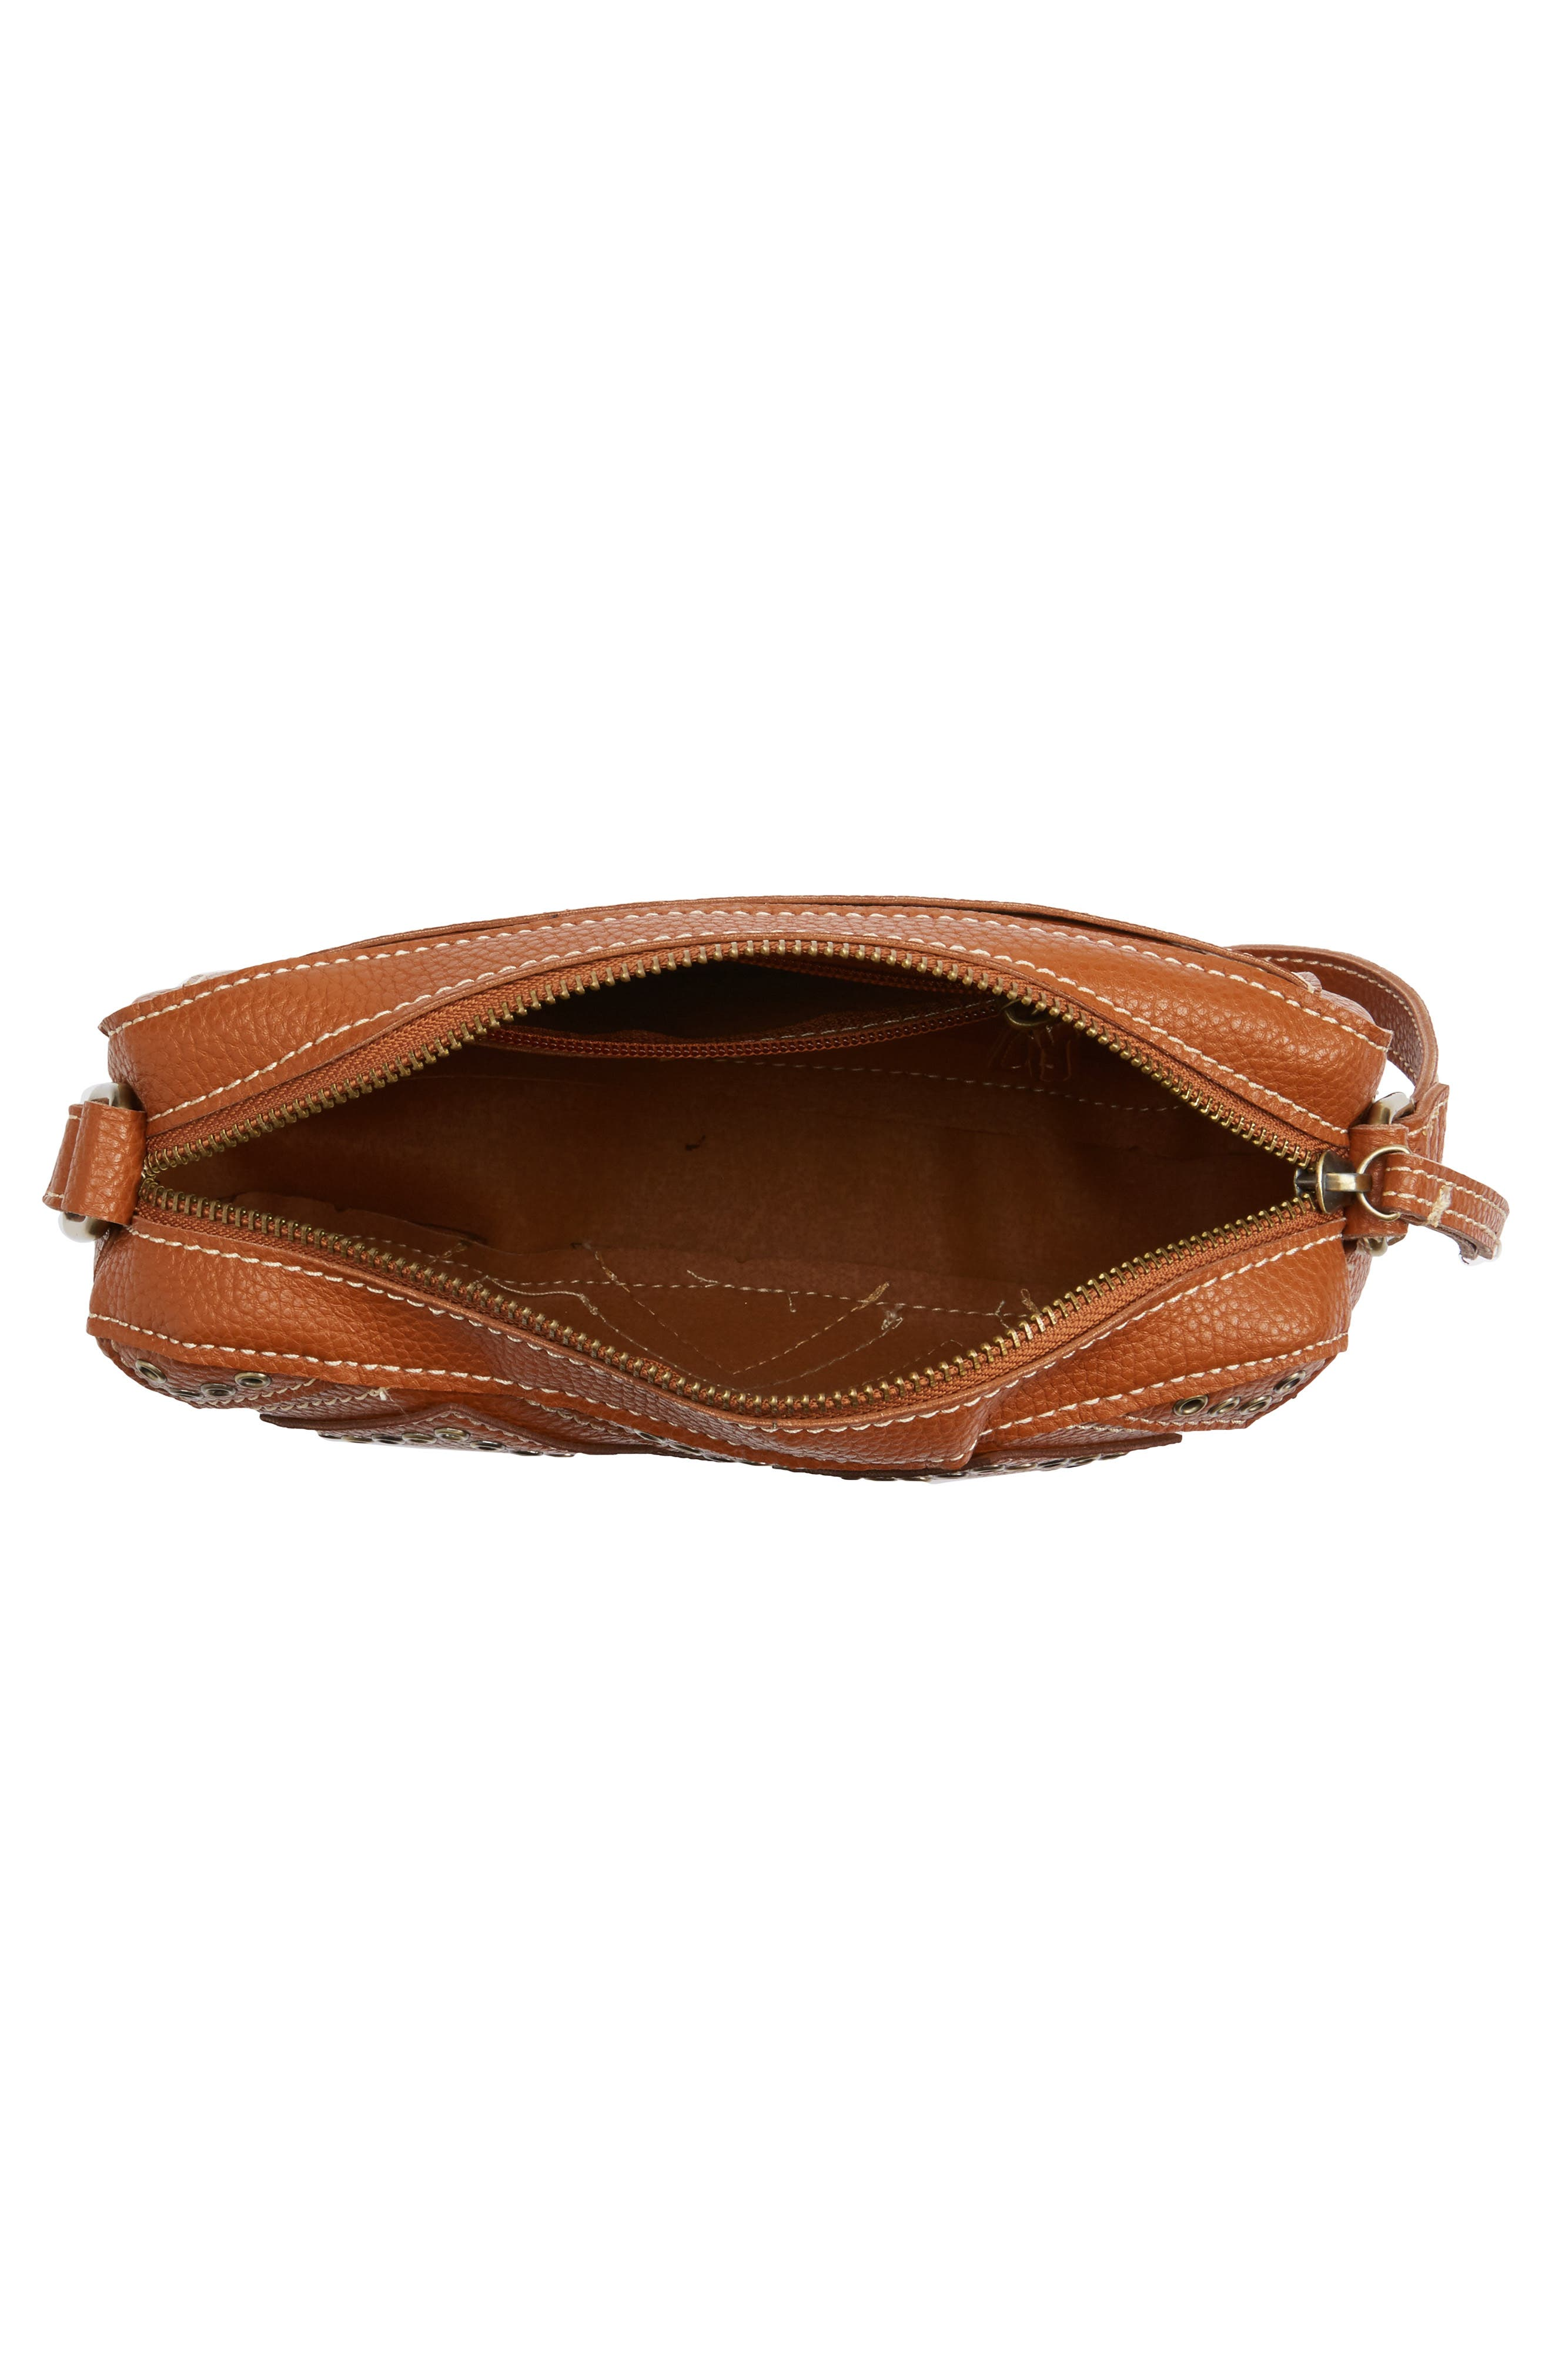 Skylar Faux Leather Crossbody Bag,                             Alternate thumbnail 4, color,                             Saddle